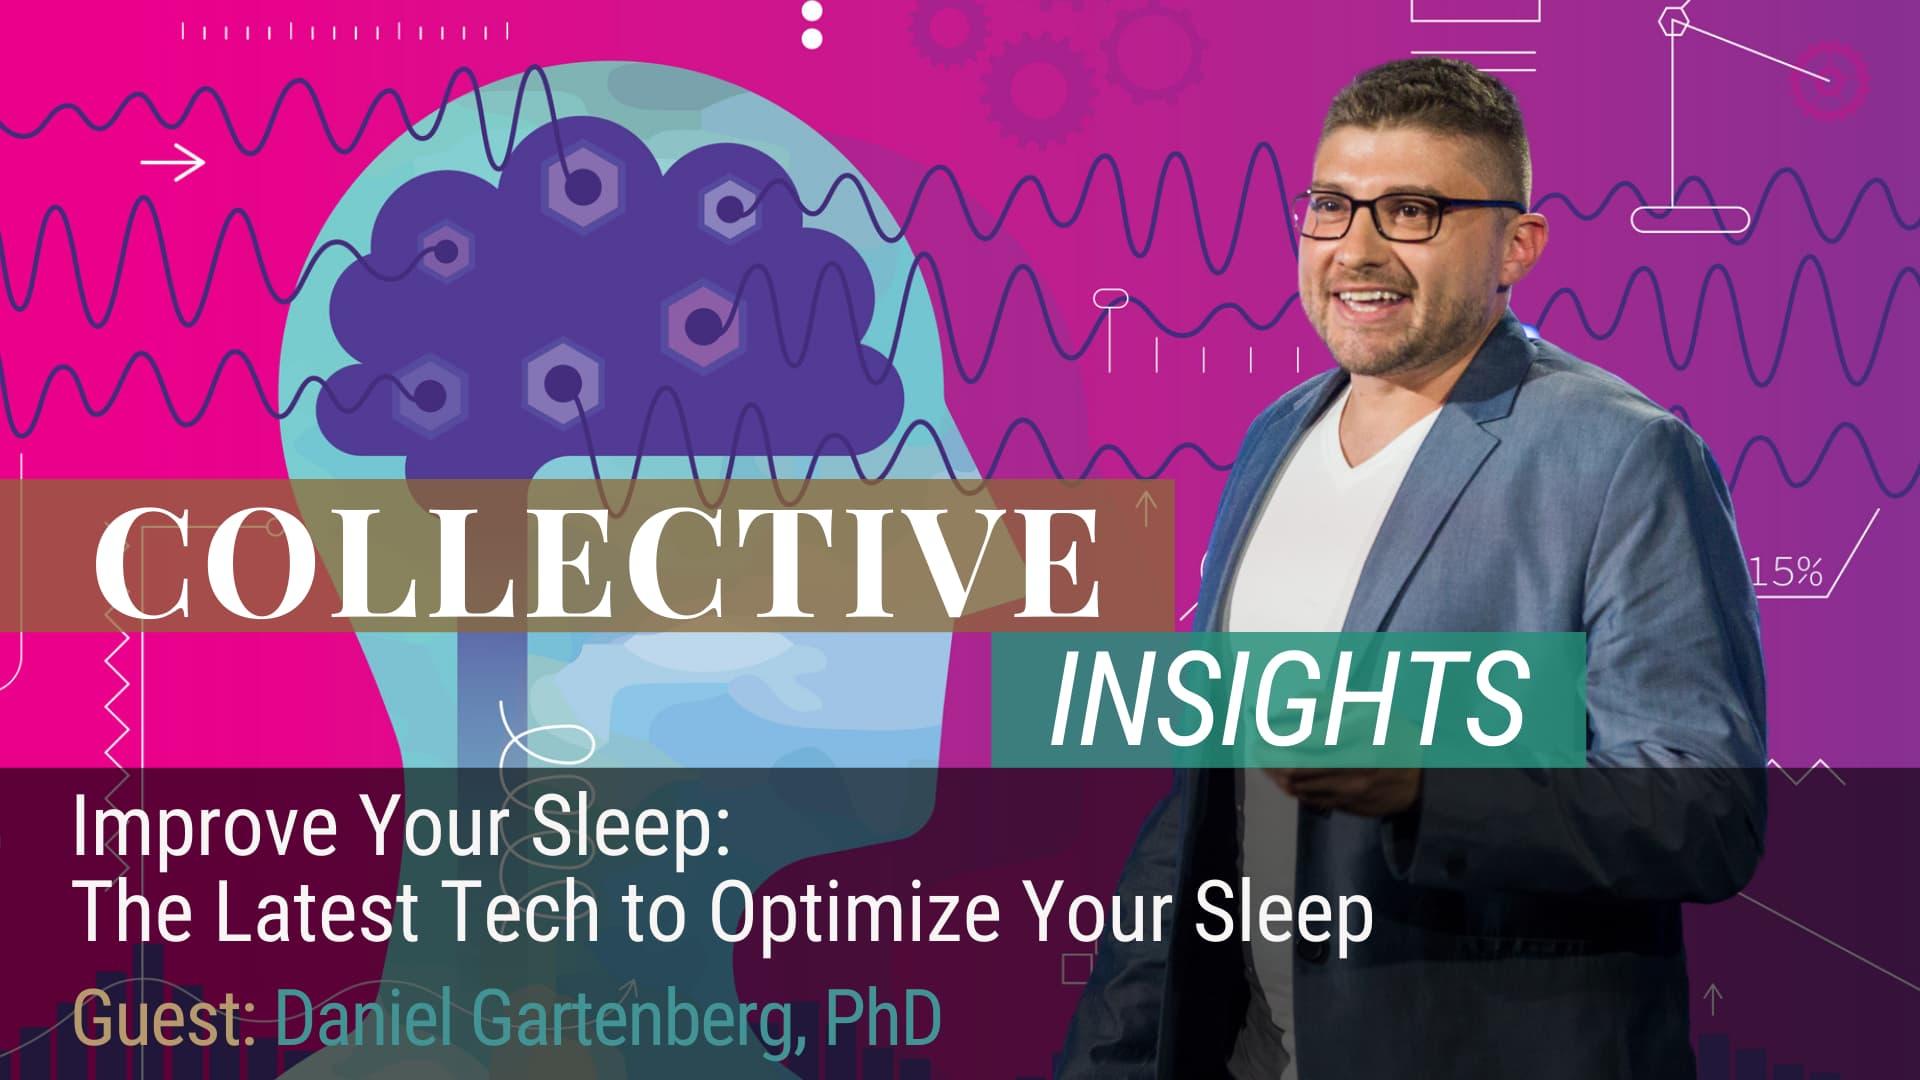 Improve Your Sleep: The Latest Tech to Optimize Your Sleep